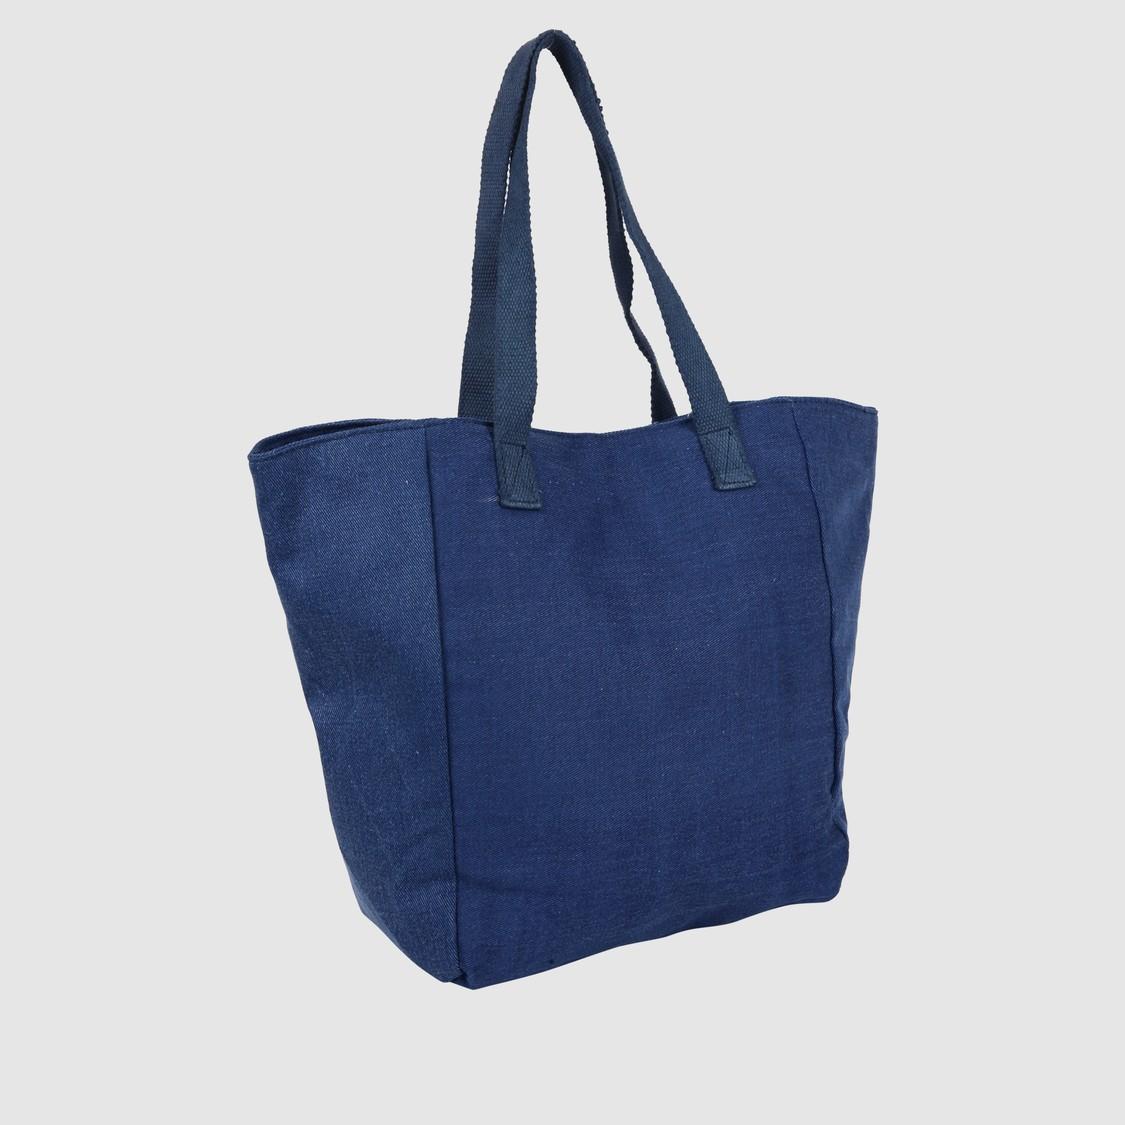 Embroidered Denim Tote Bag